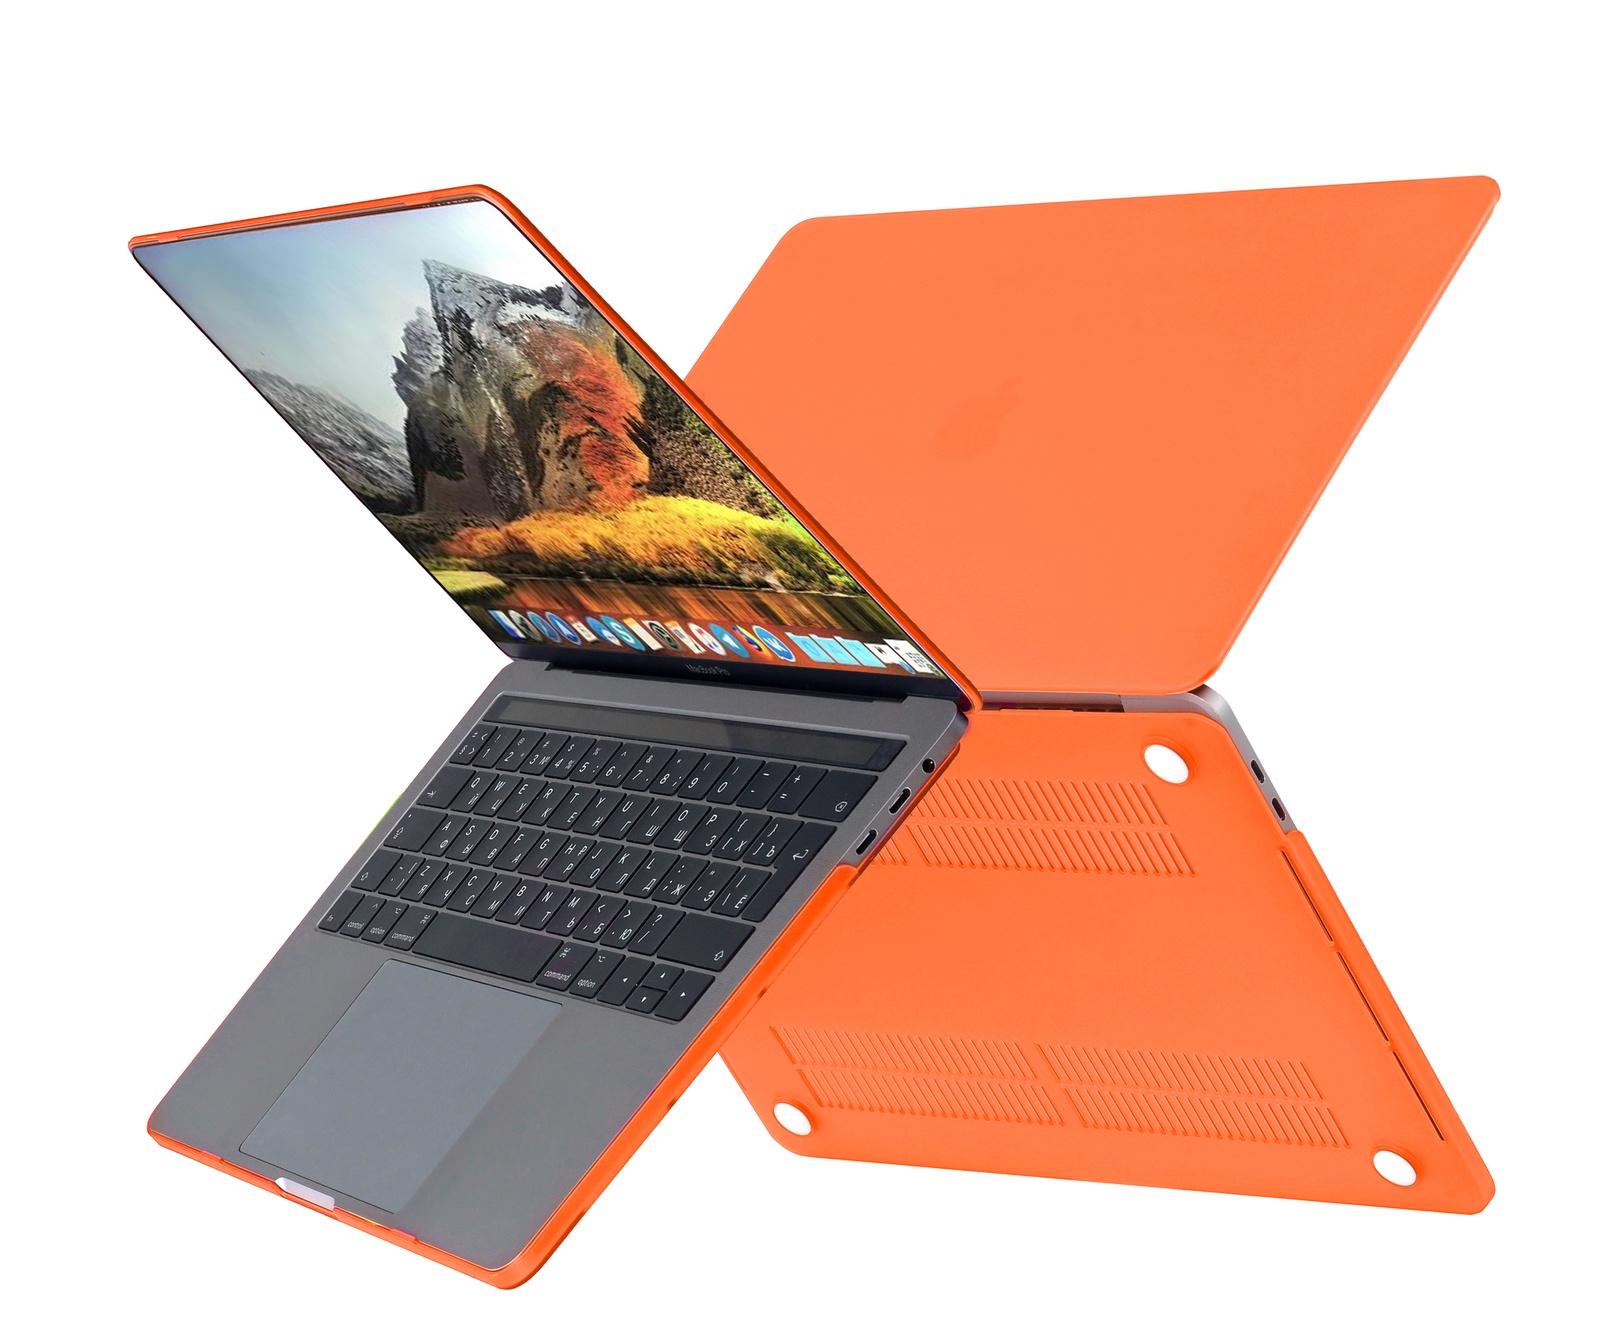 Чехол HardShell Case для Macbook 12, оранжевый